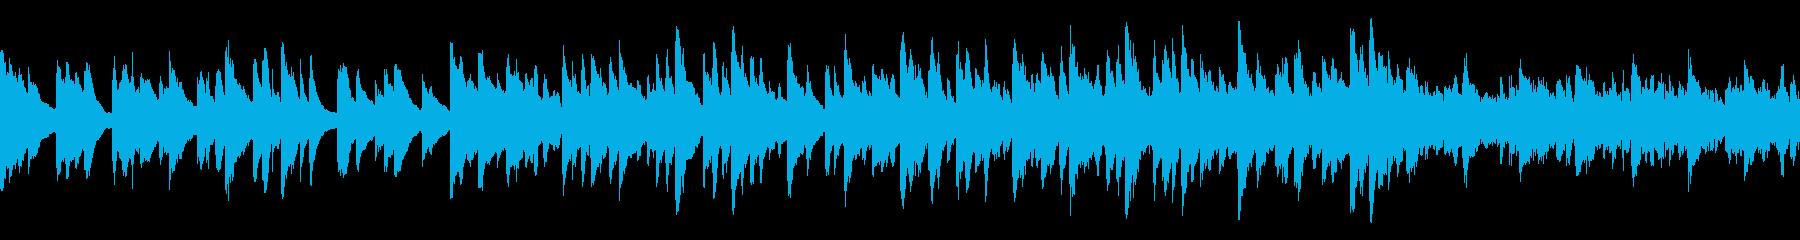 [Loop]物悲しいピアノヒーリングの再生済みの波形